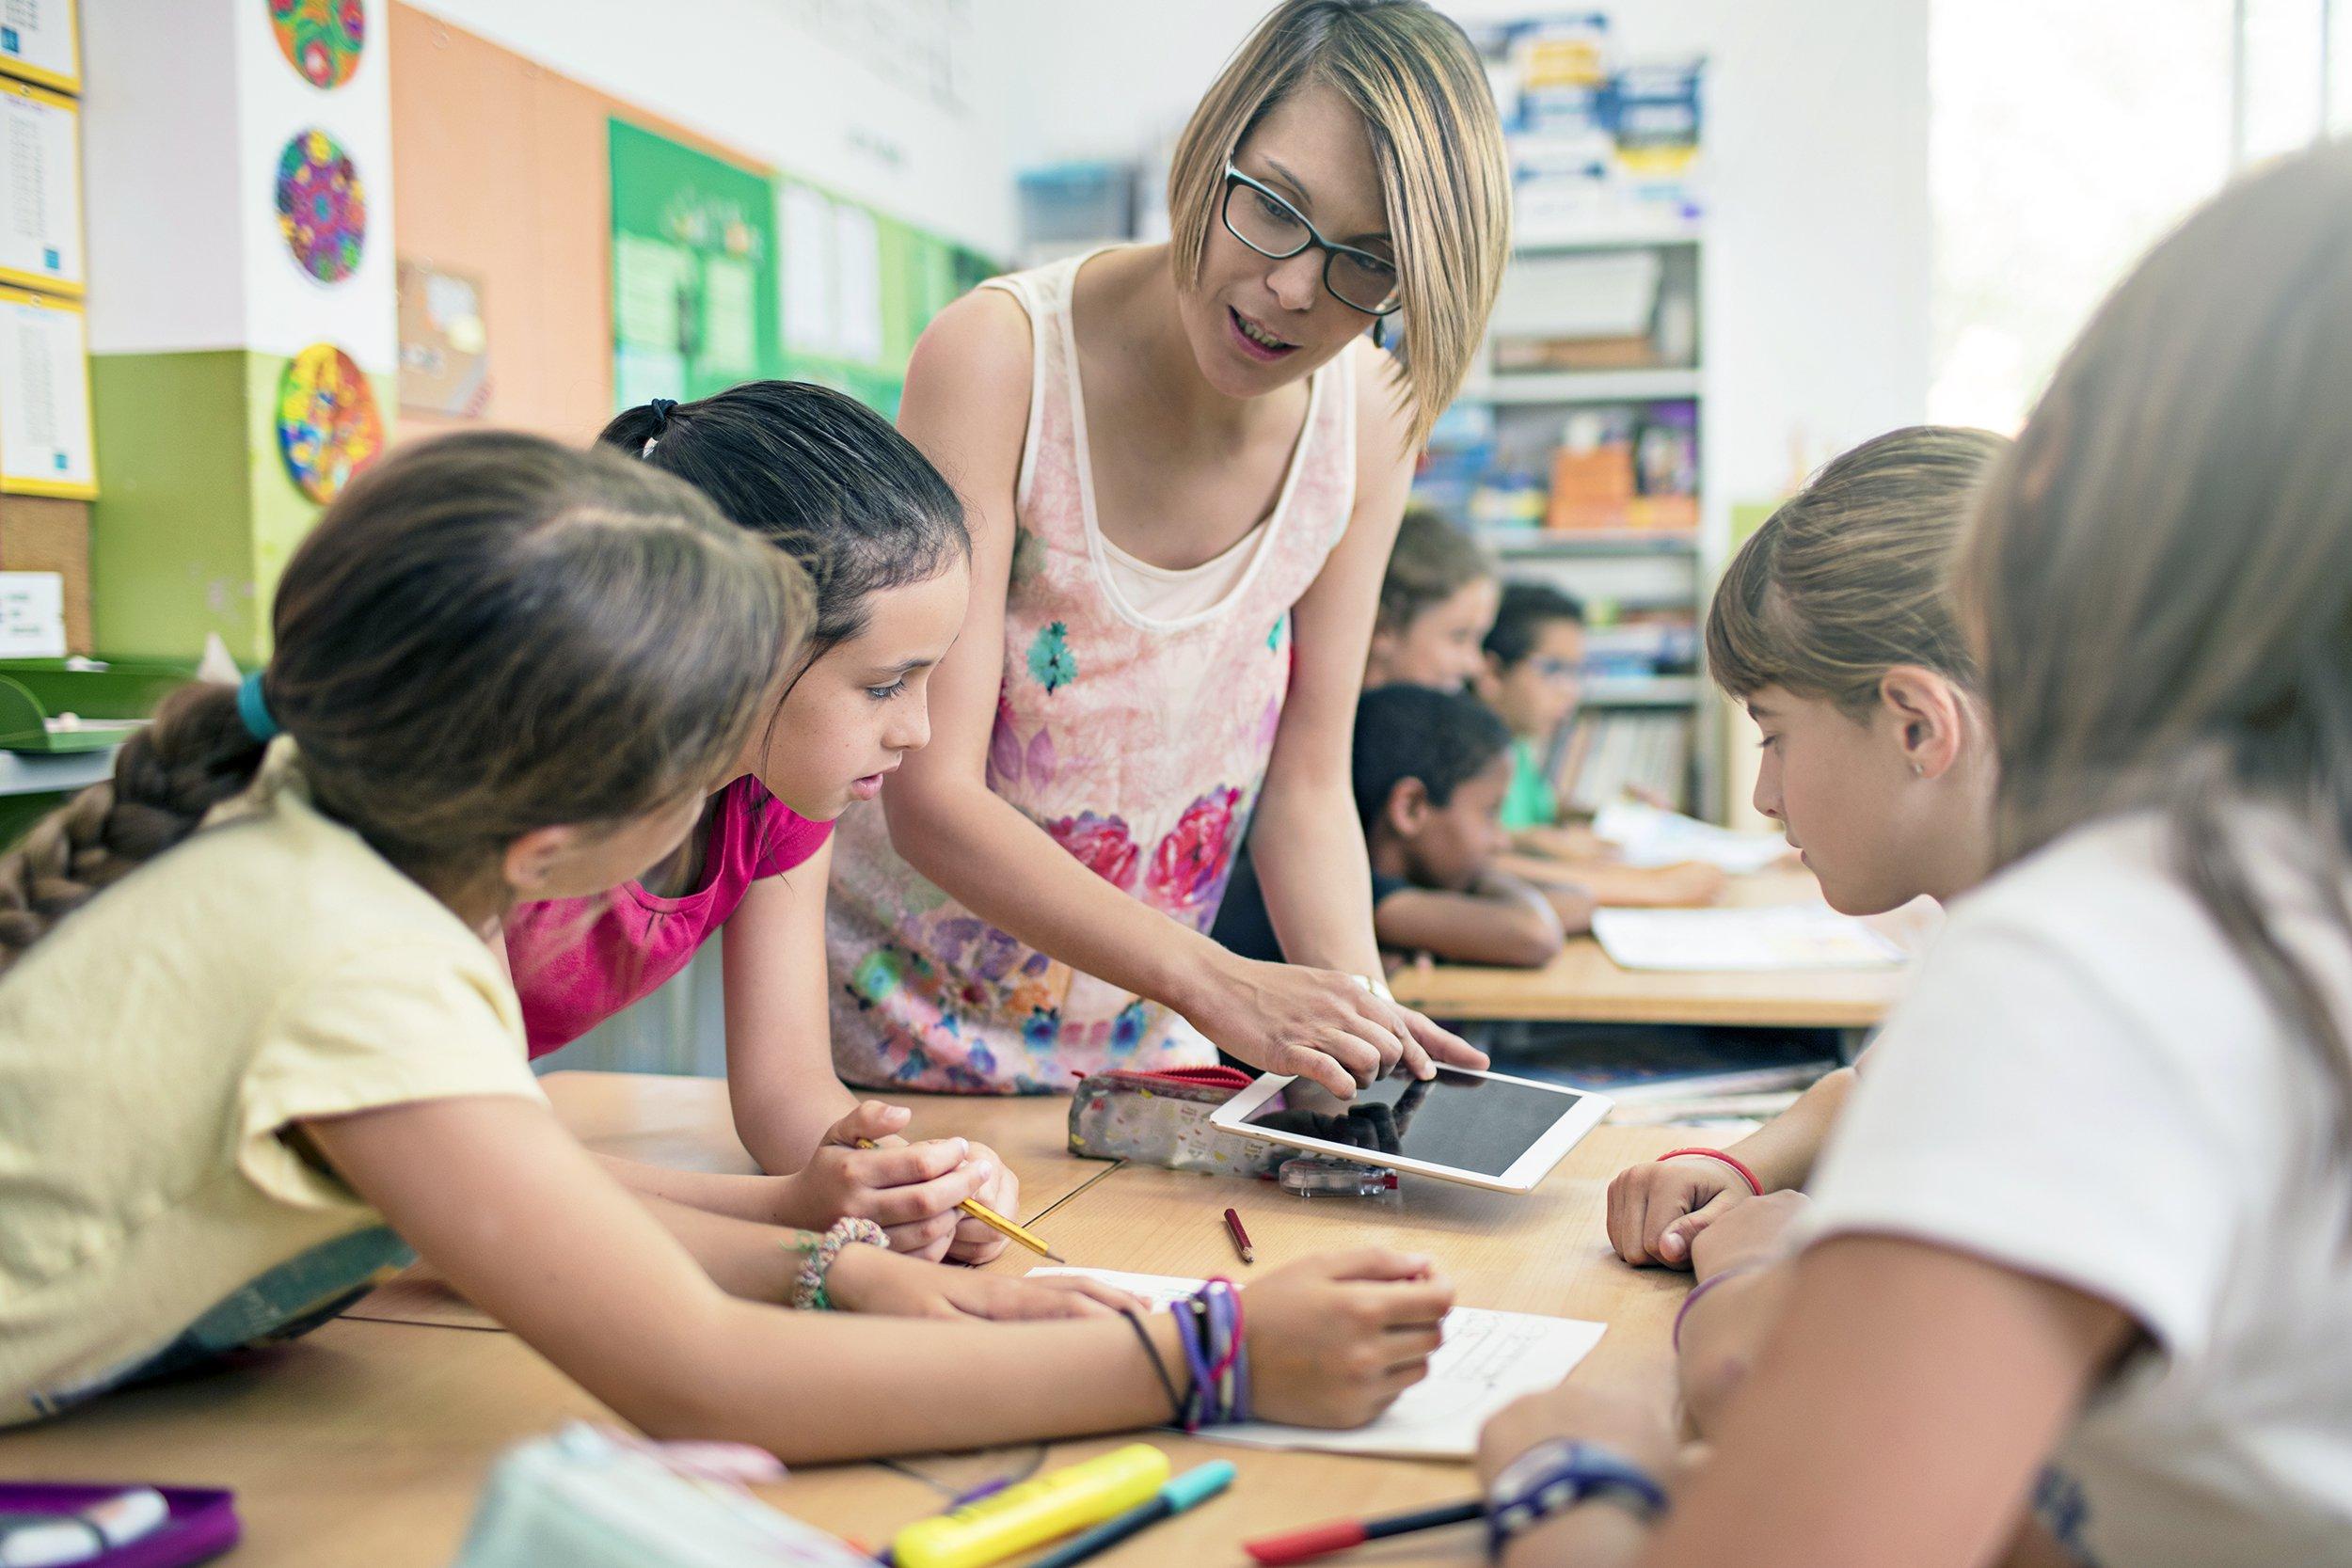 050418_teachers_pay_around_the_world_slide_17_f.original.jpg